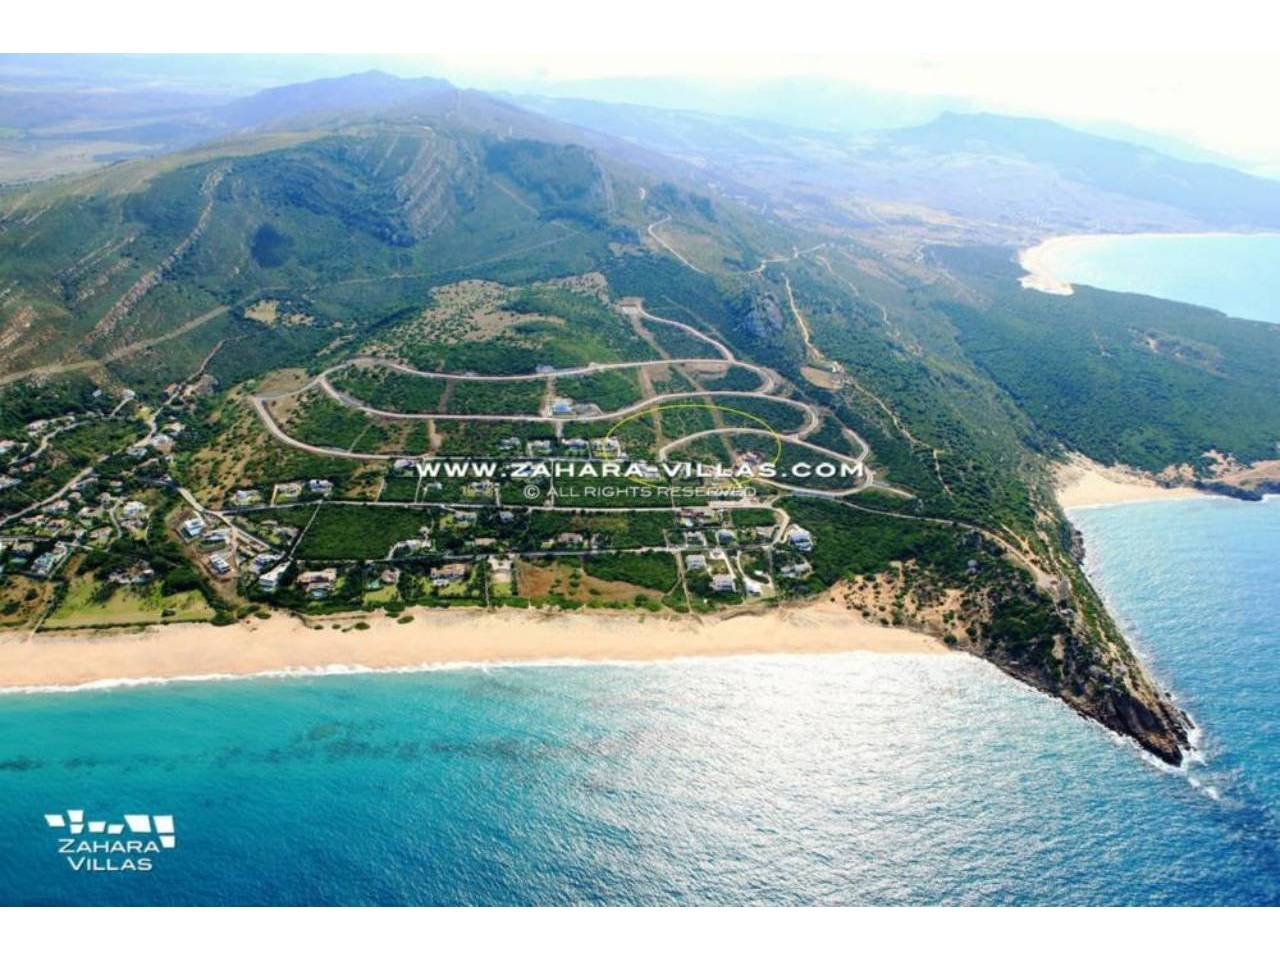 Imagen 2 de Plot New Construction For Sale in Zahara de los Atunes